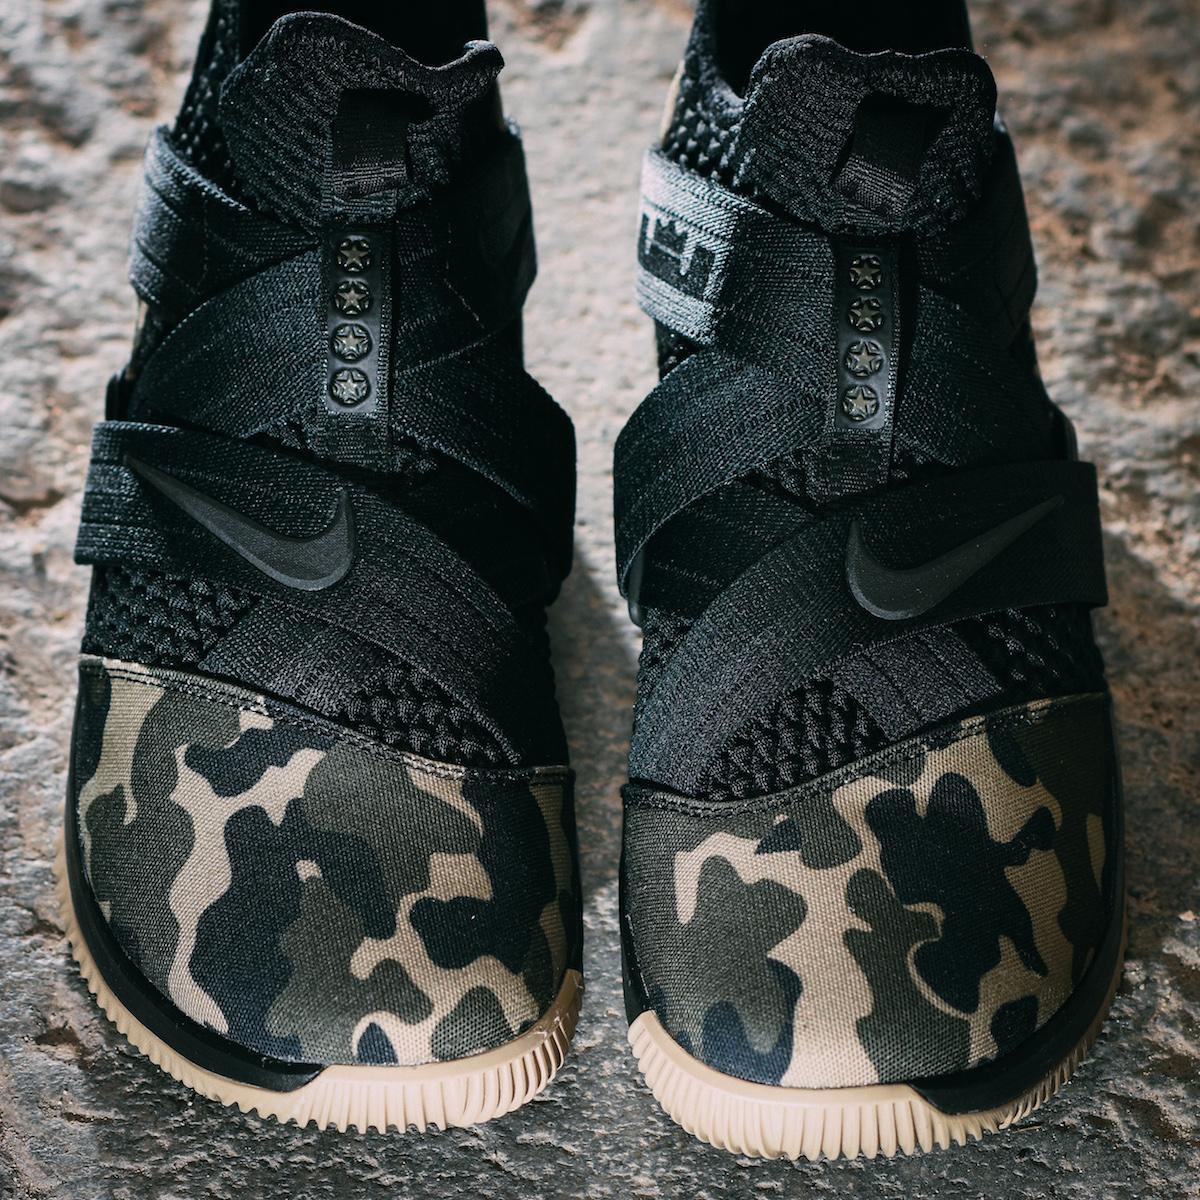 2e84a967cdcd2 LEBRON SOLDIER XII SFG HAZEL RUSH Nike AO4054-001